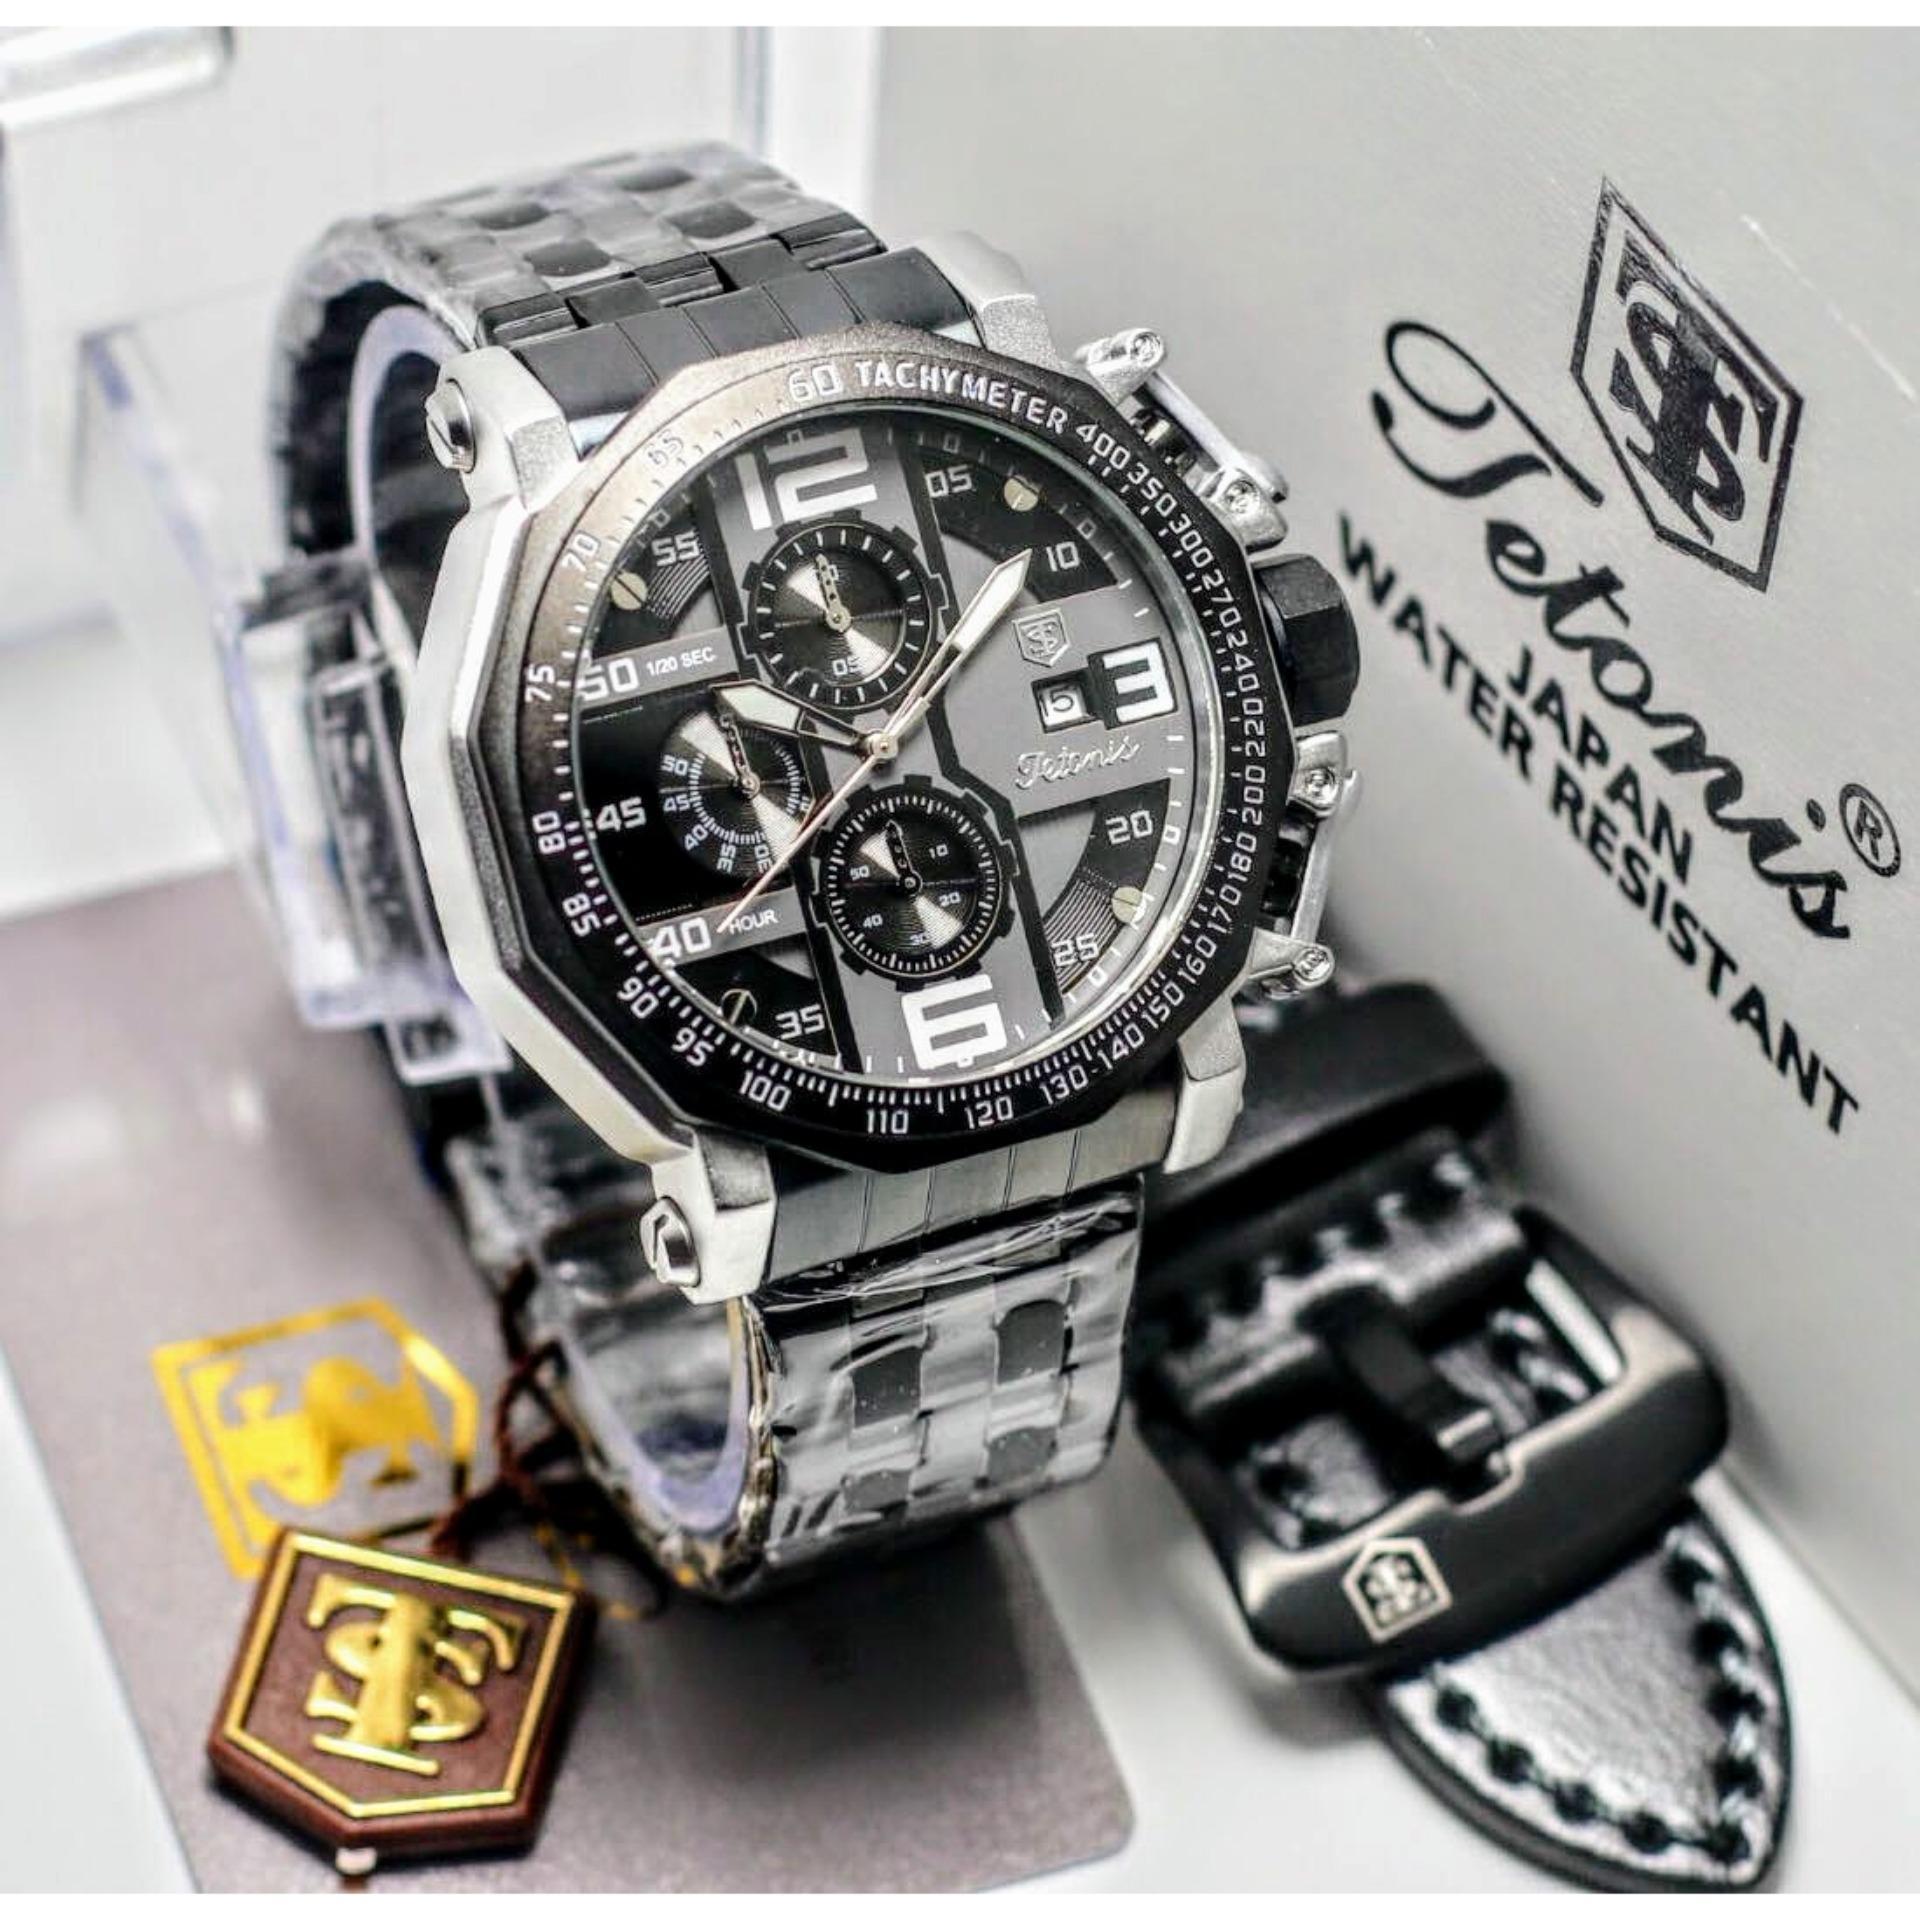 Kehebatan Jam Tangan Quicksilver Tanggal Hari Aktif Tali Kulit Kemeja Original Coklat Tetonis Pria Fashion Elegant Keluaran Terbaru Chronograph Bonus